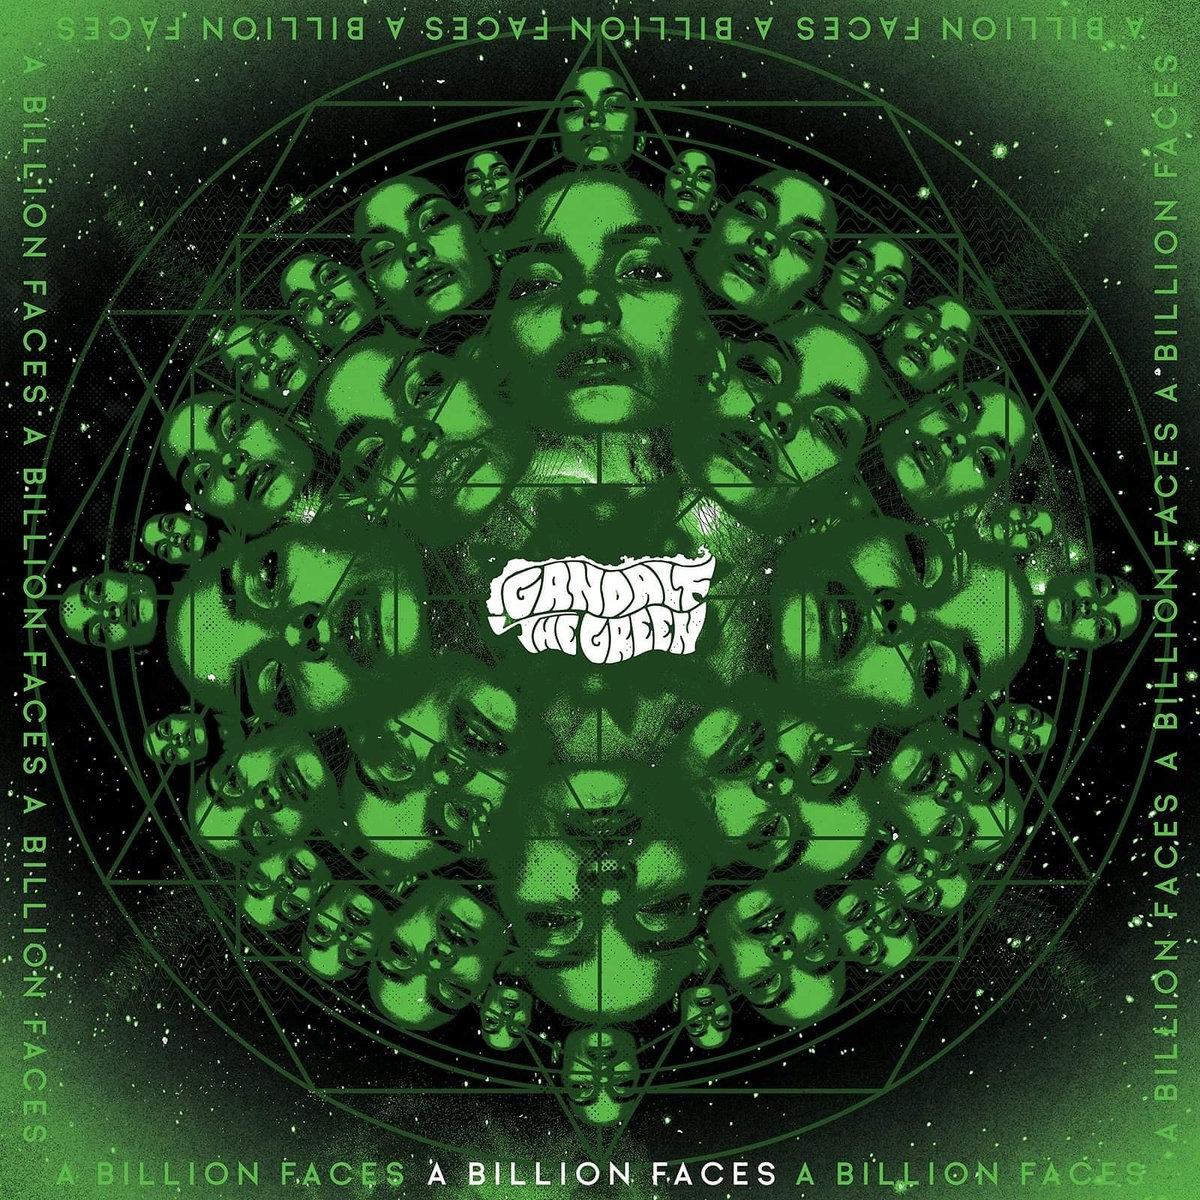 gandalf the green a billion faces